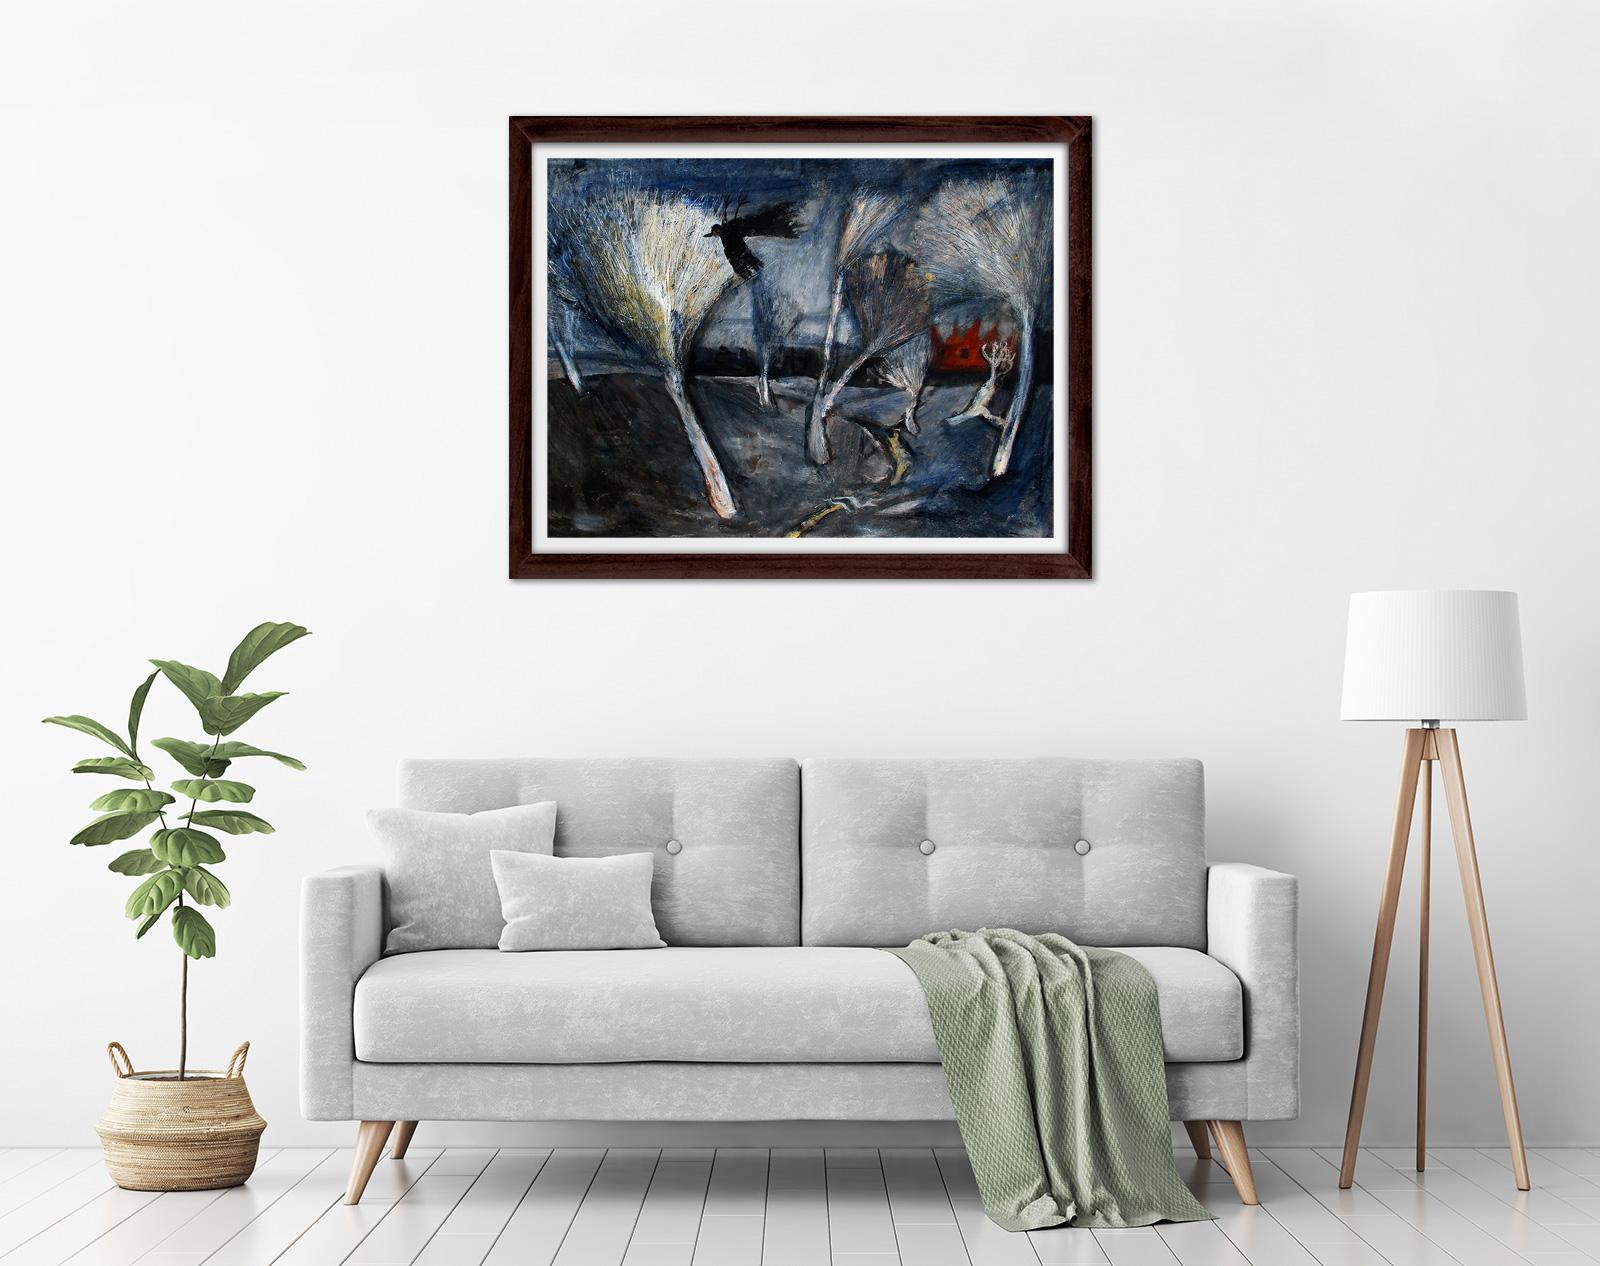 Glenn Brady - 'Bleached Landscape' Framed in a room